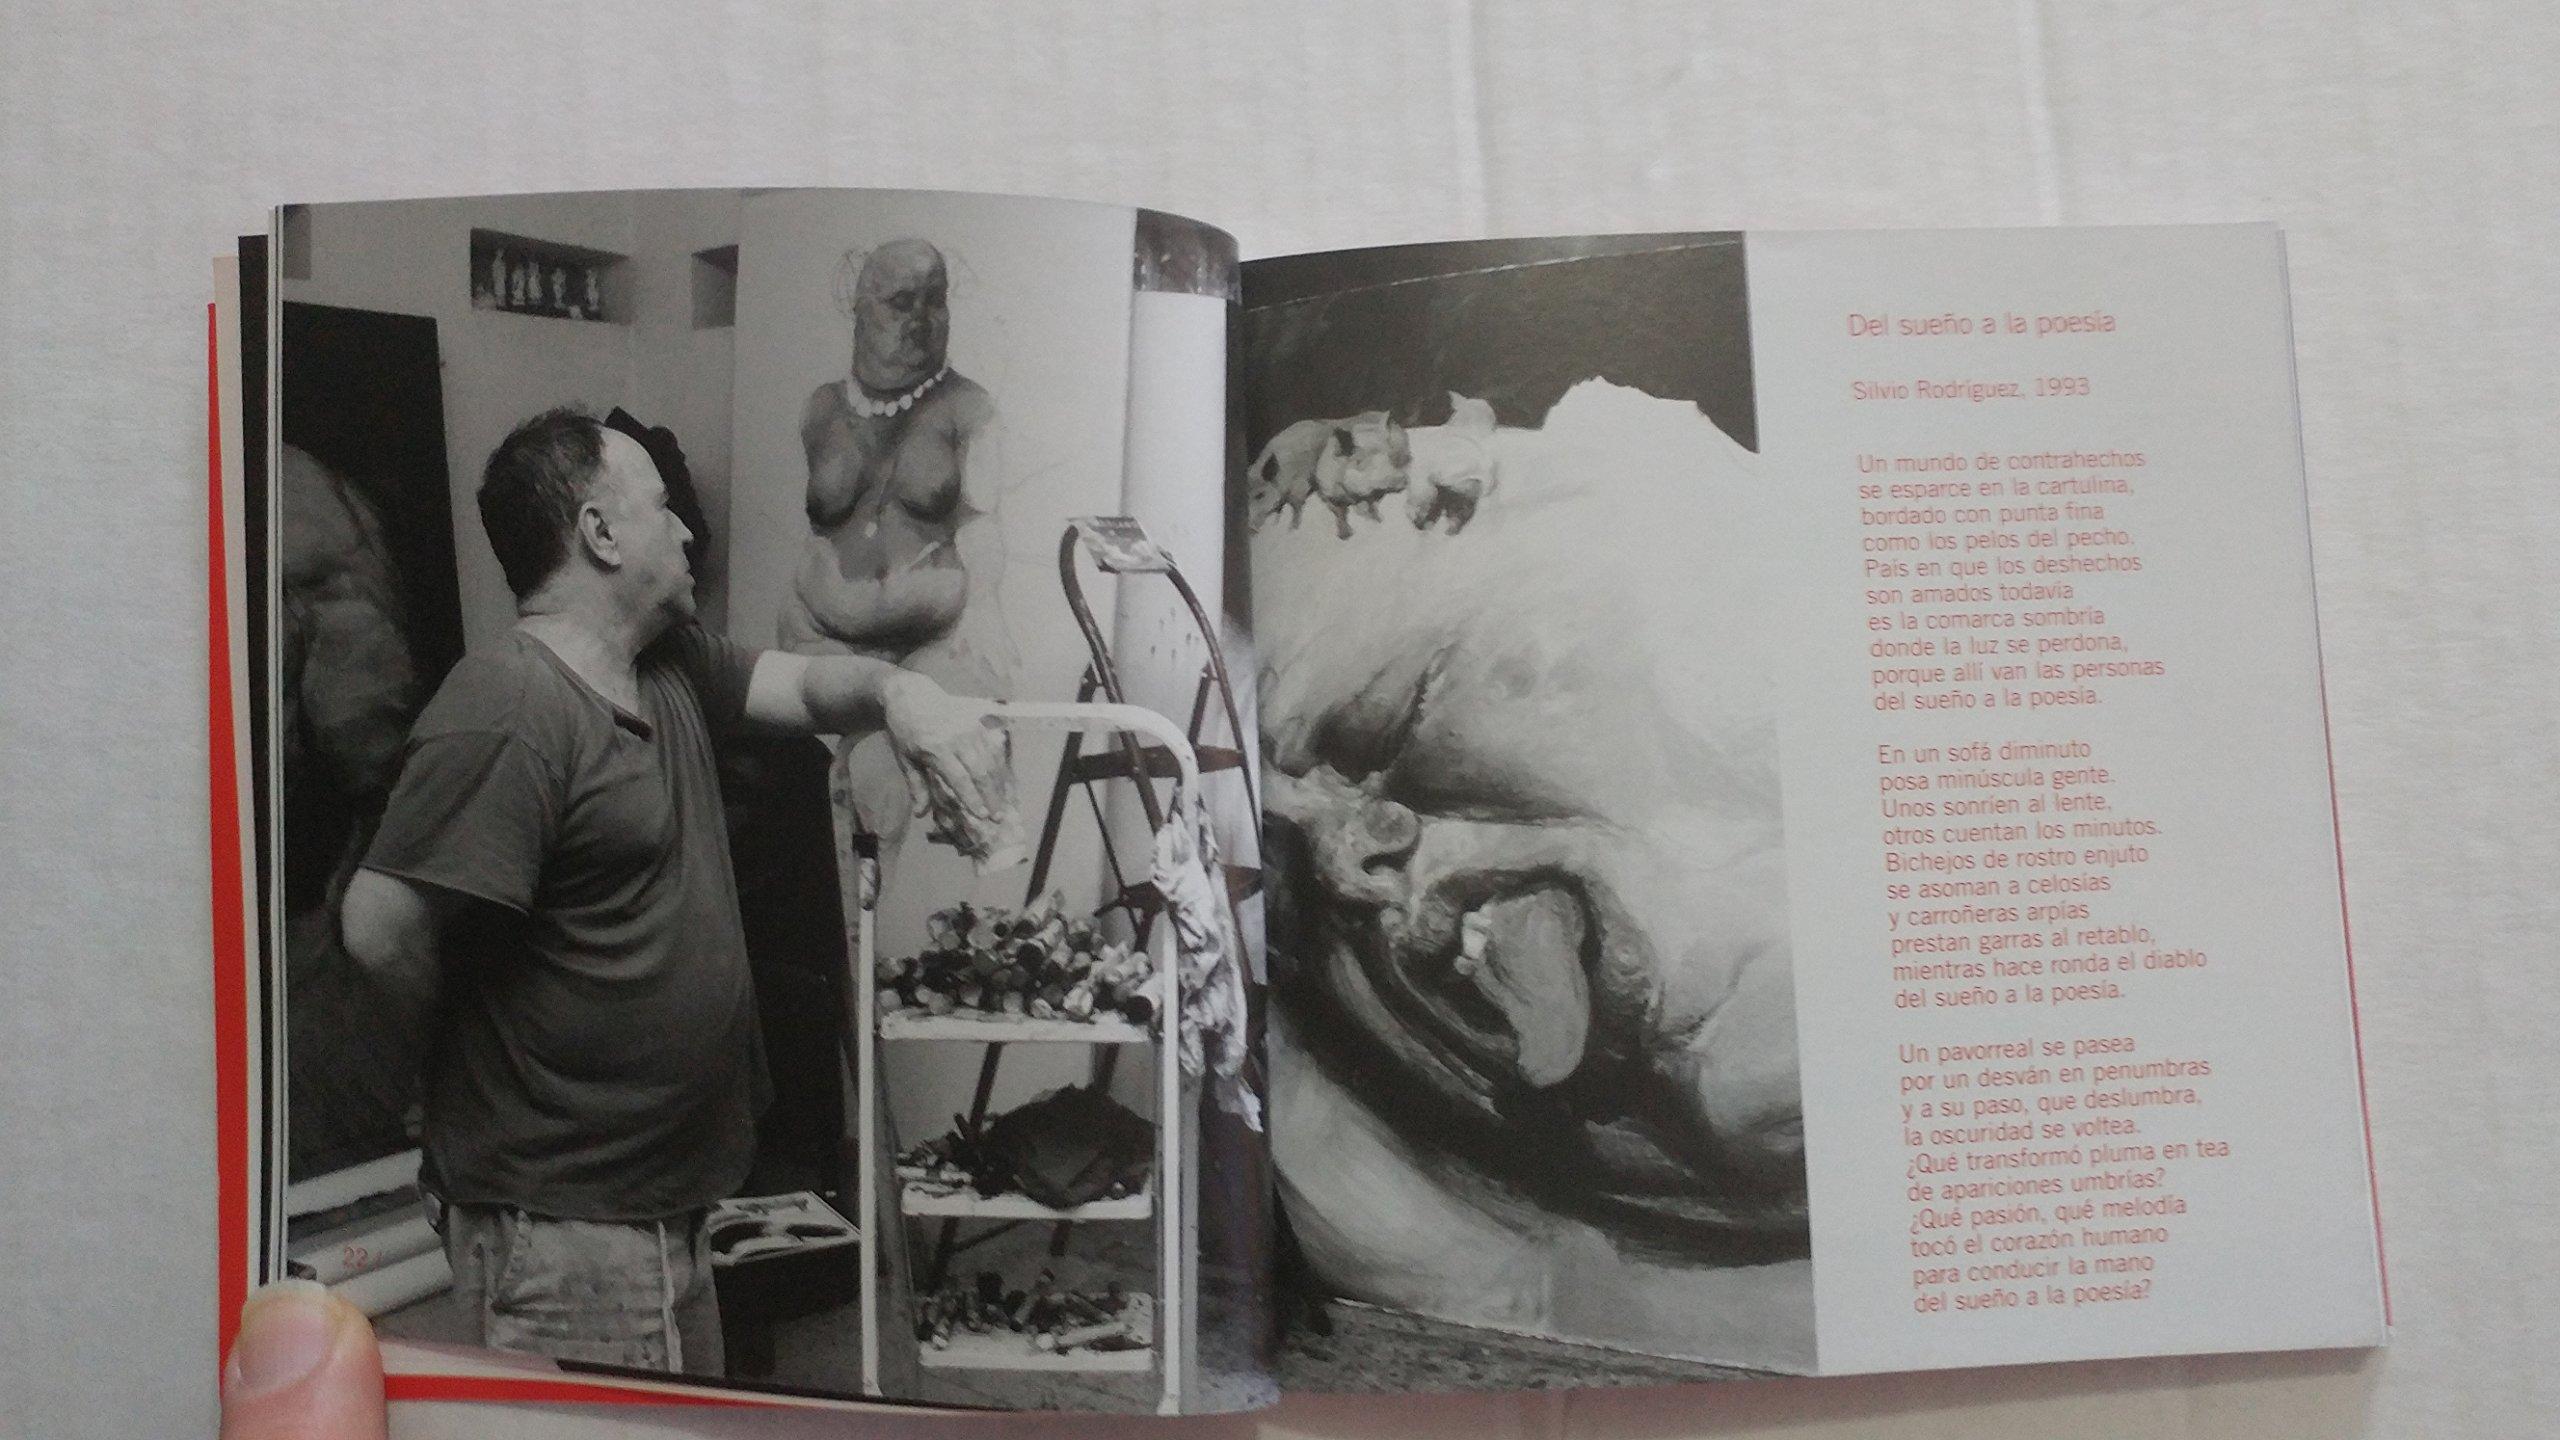 Amazon.com: Roberto fabelo.catalogo de arte. (9789597178309 ...